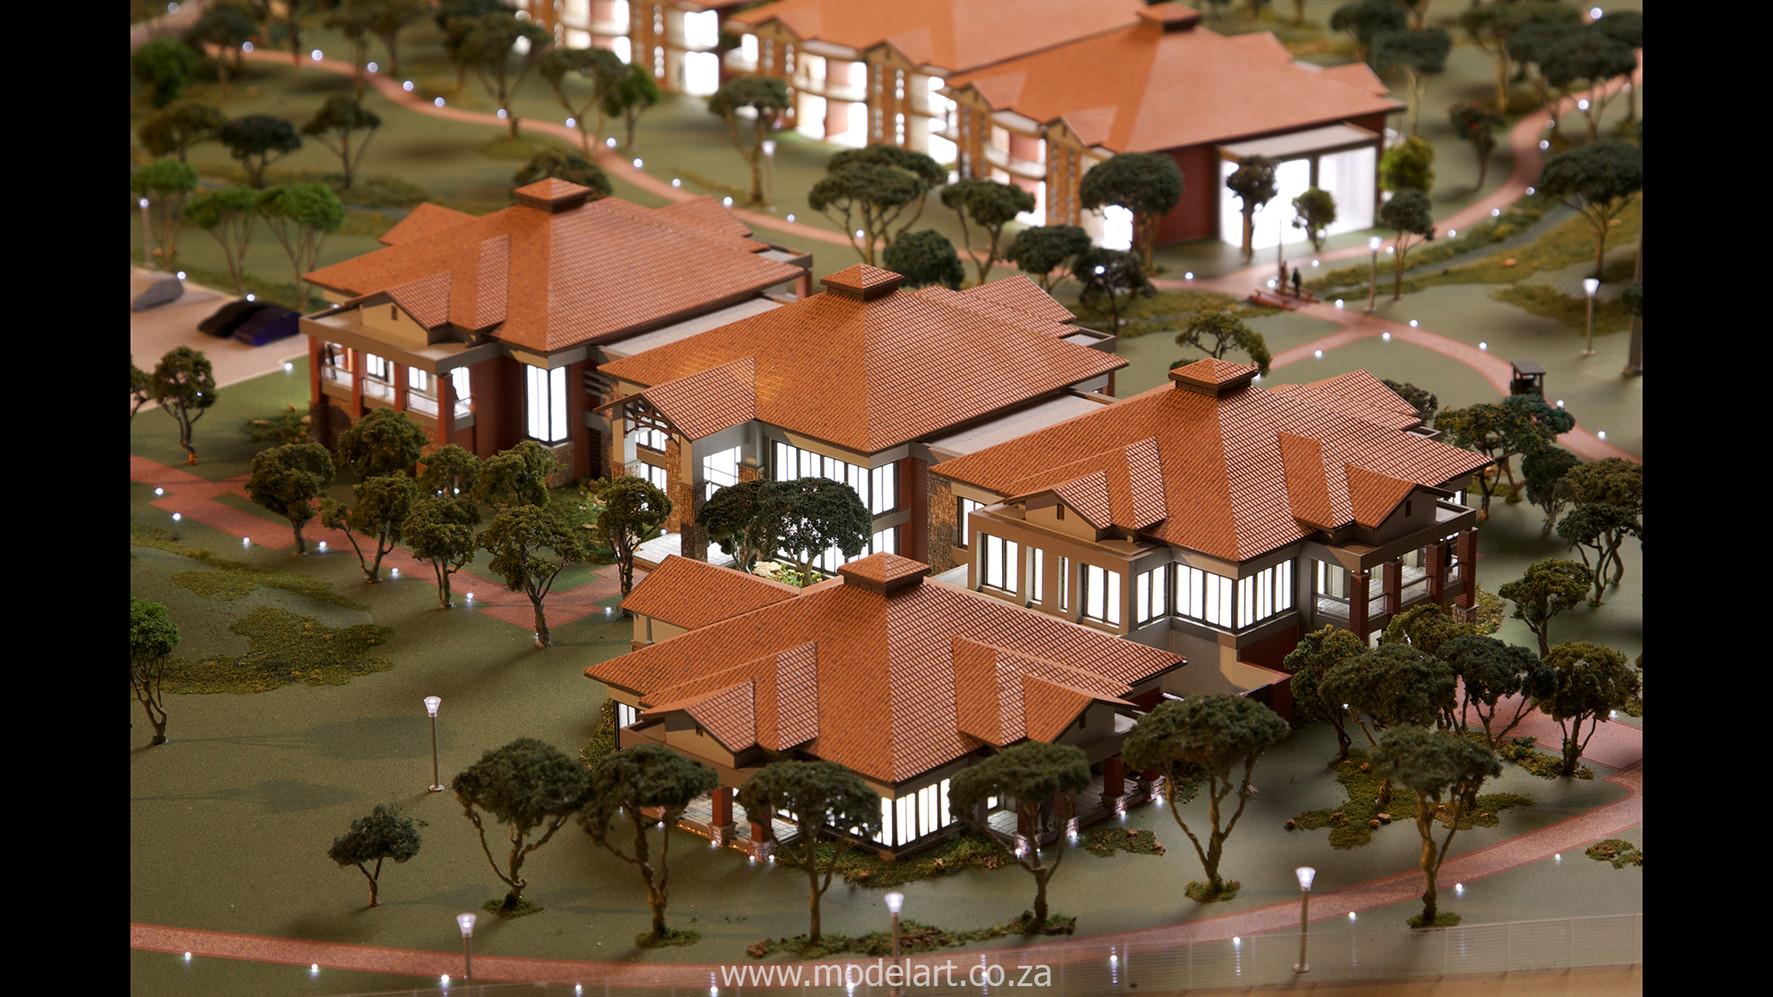 Architectural-Scale-Model-Sports Facilities-Royal Bafokeng Campus 2-4